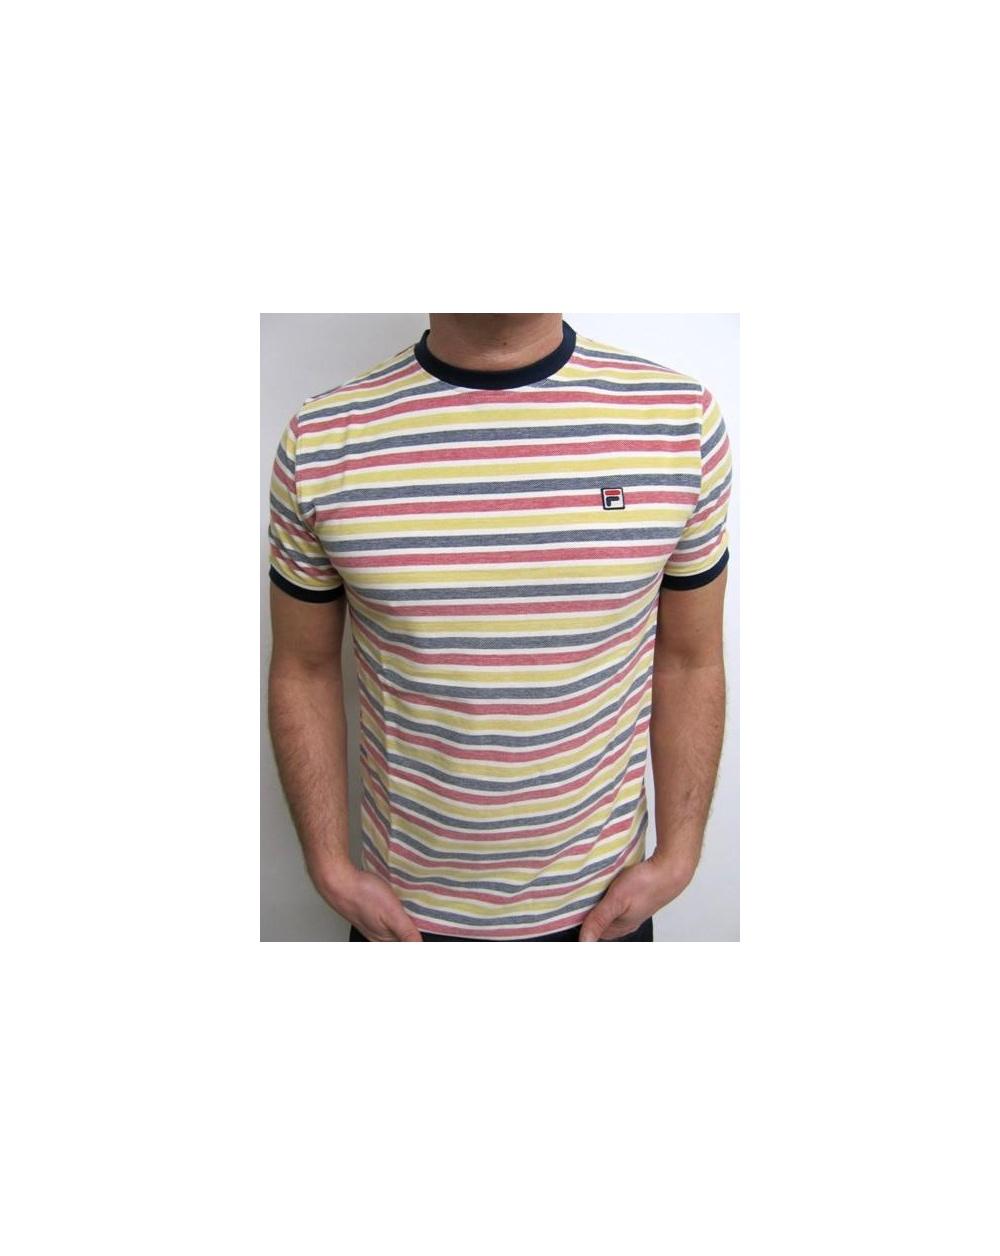 Fila Vintage Nautybuoy Striped T Shirt Navy Yellow Red